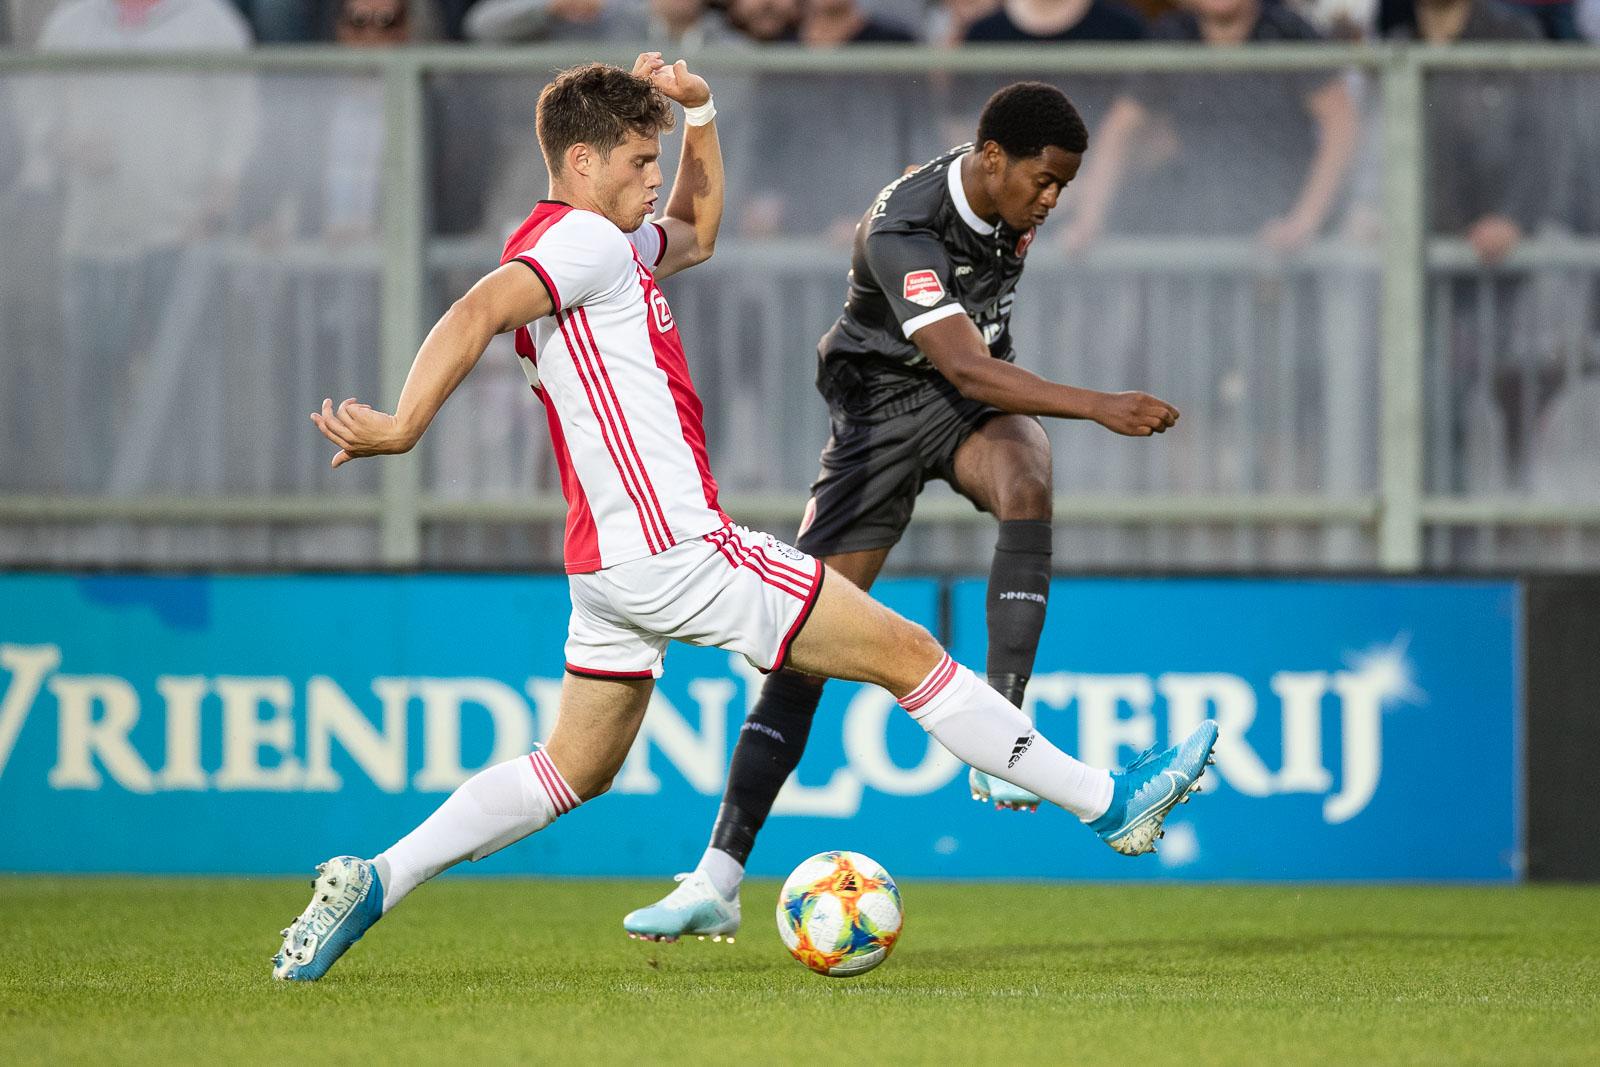 1 augustus eerste wedstrijd met publiek: Jong Ajax